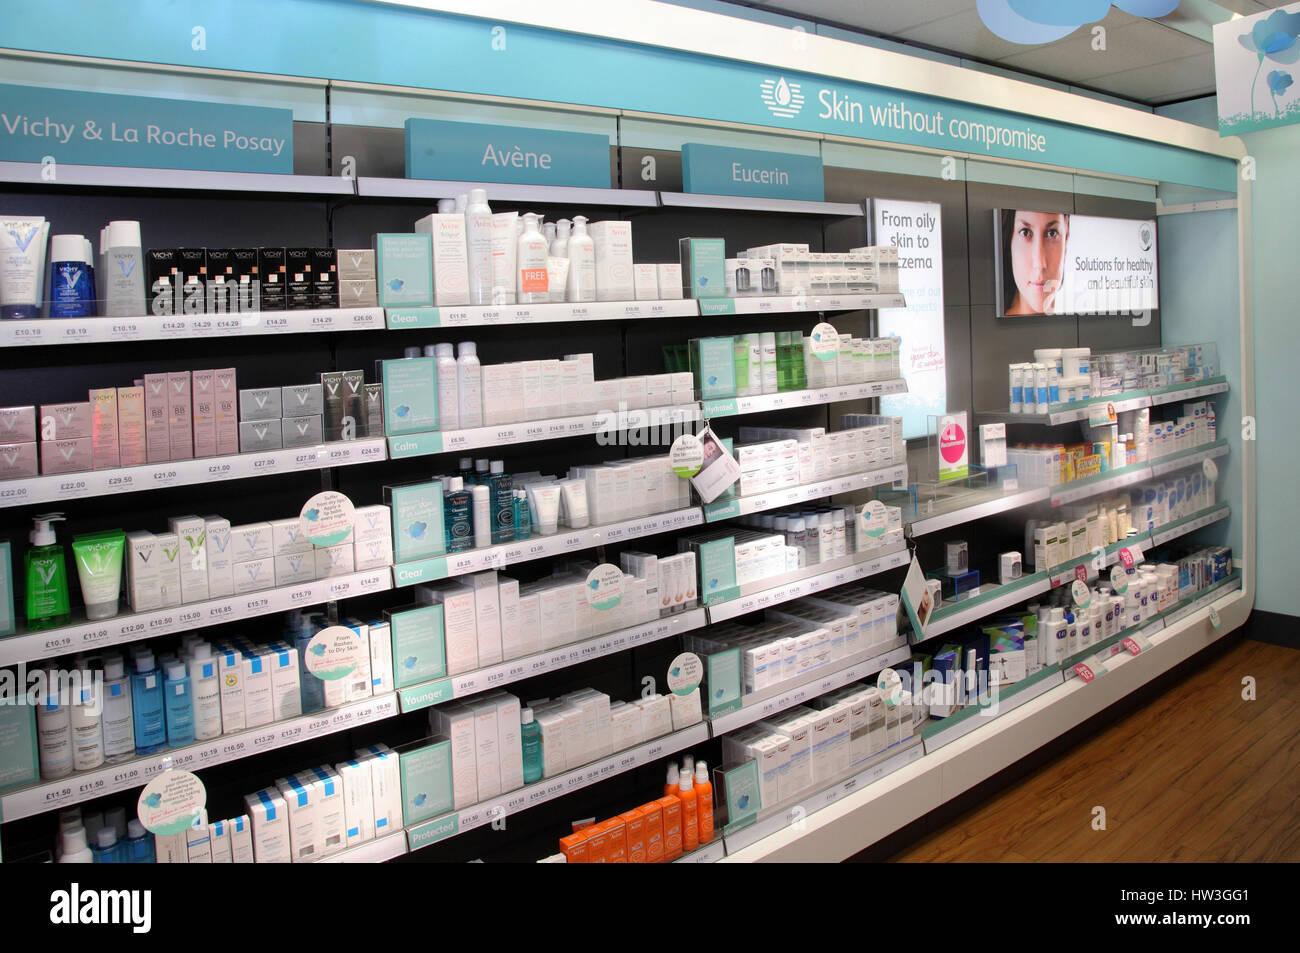 La roche posay farmacias